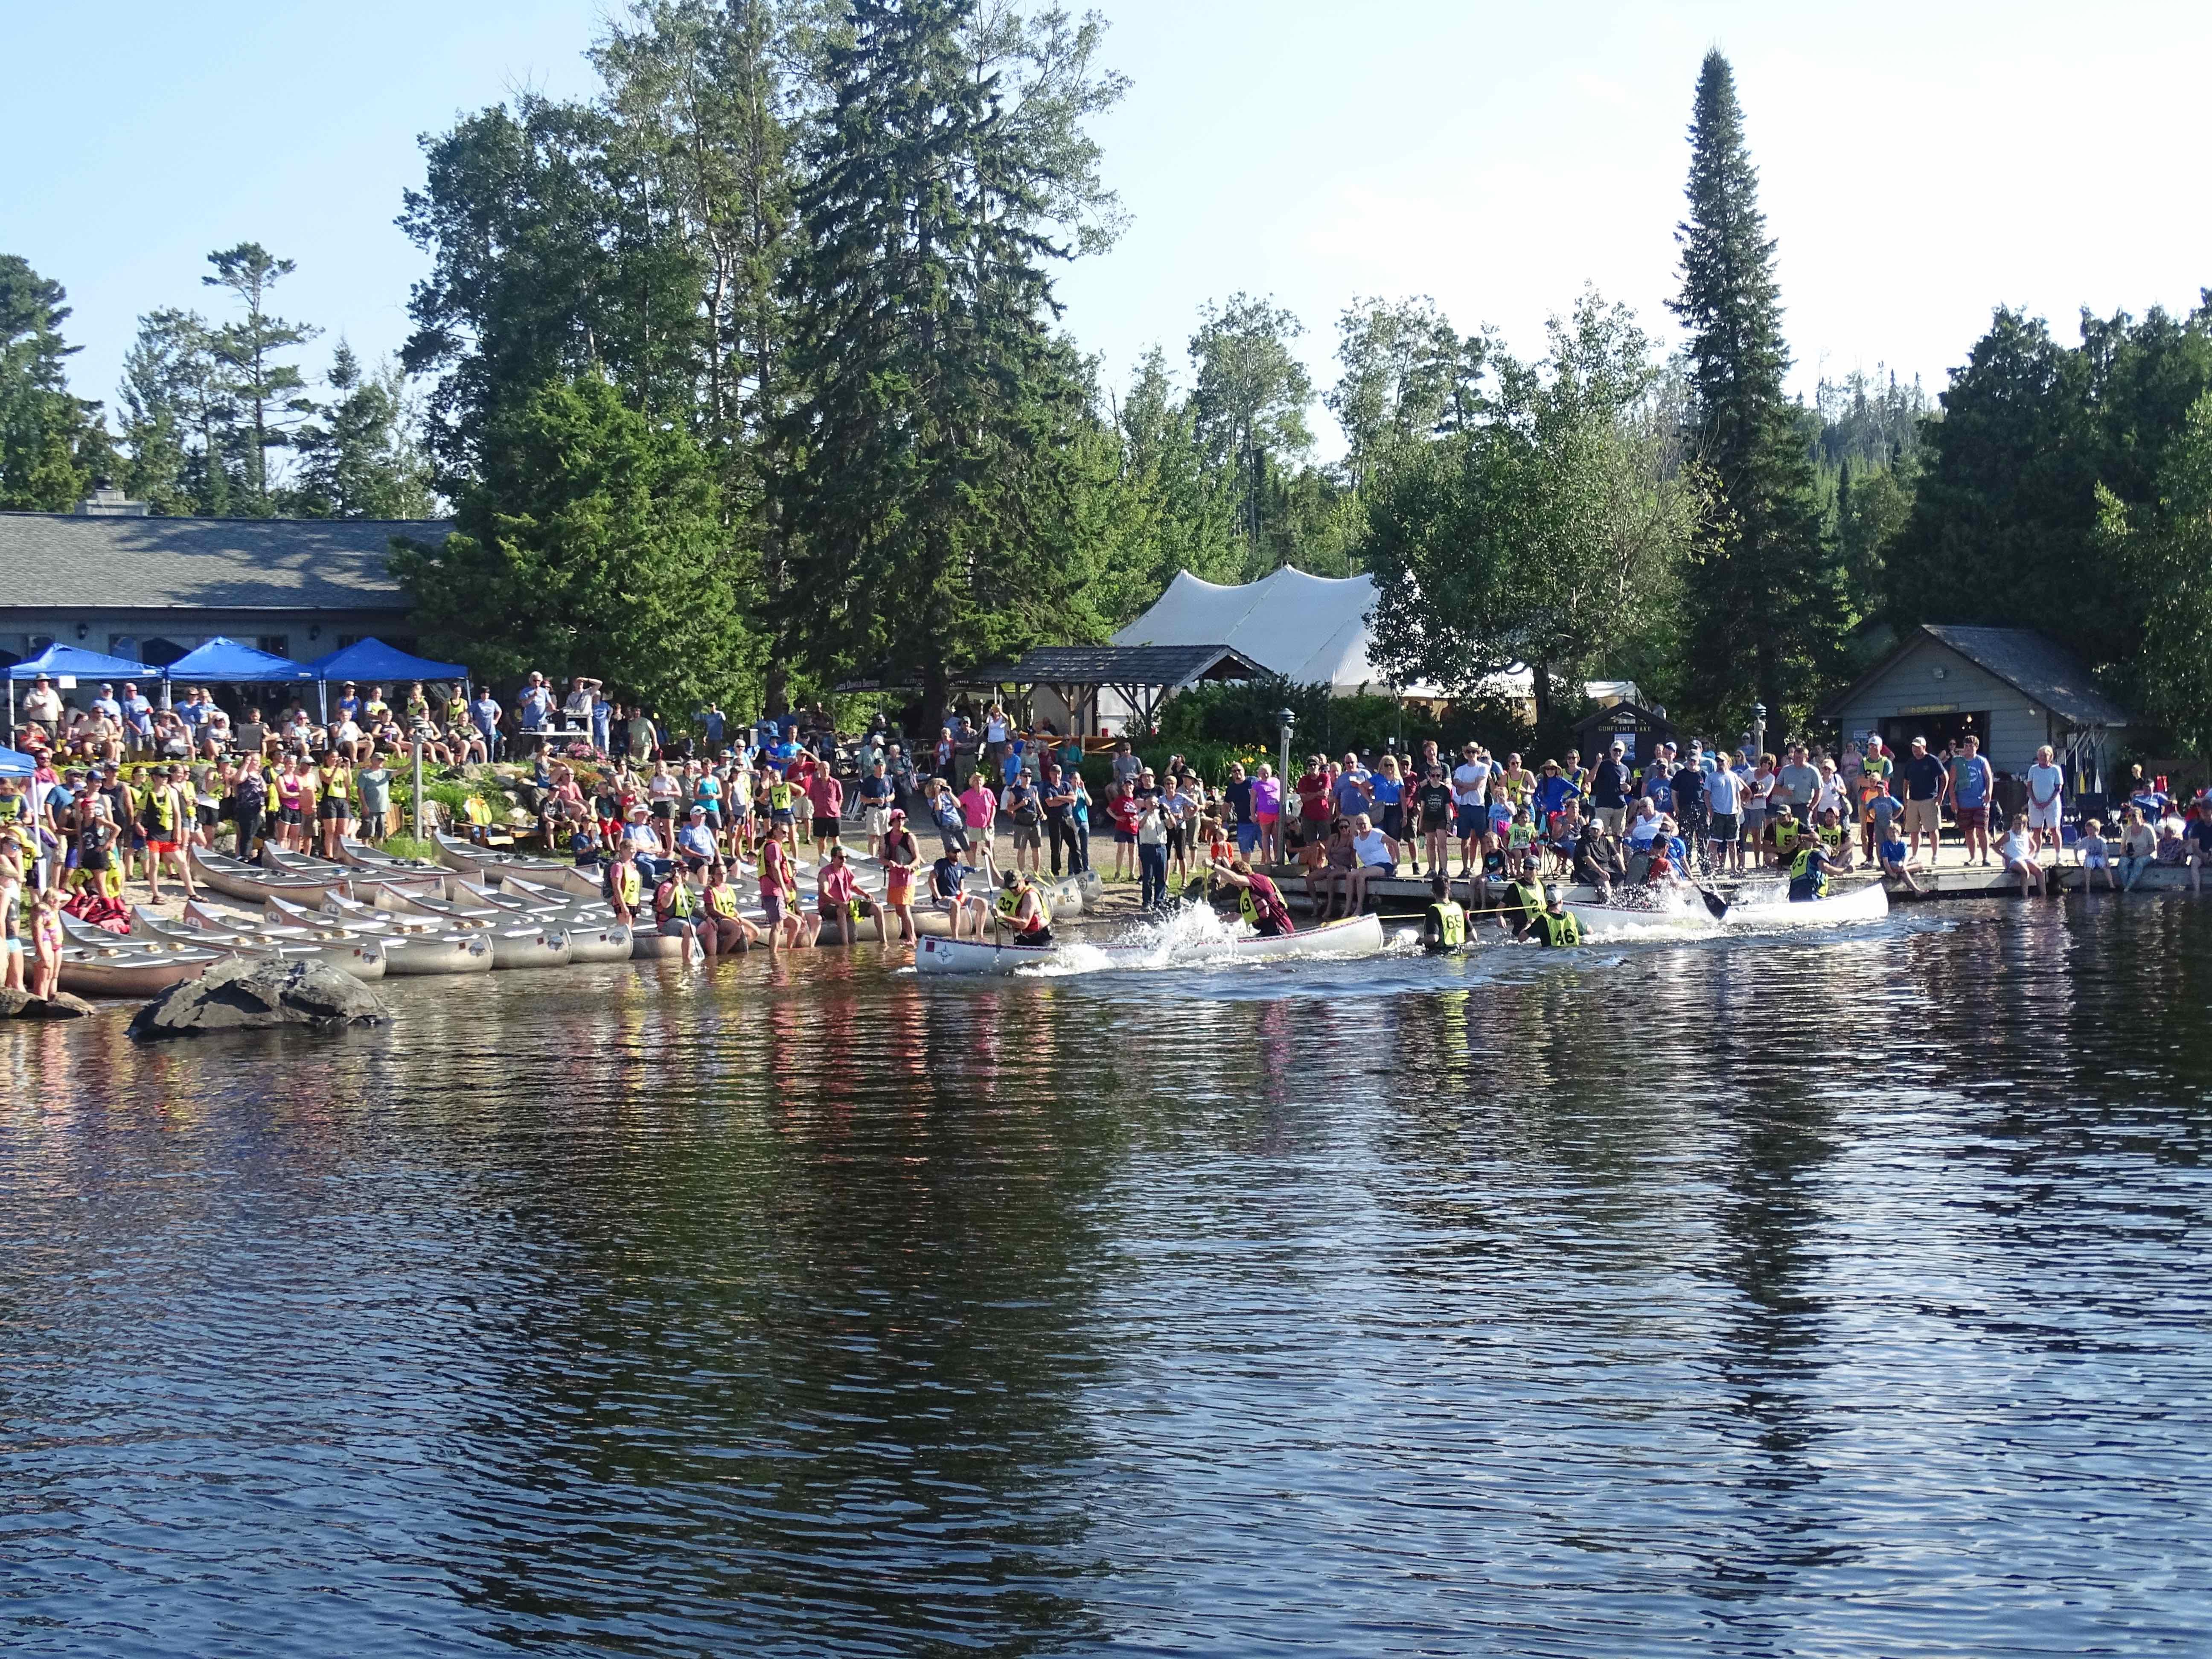 Gunflint Trail Canoe Races